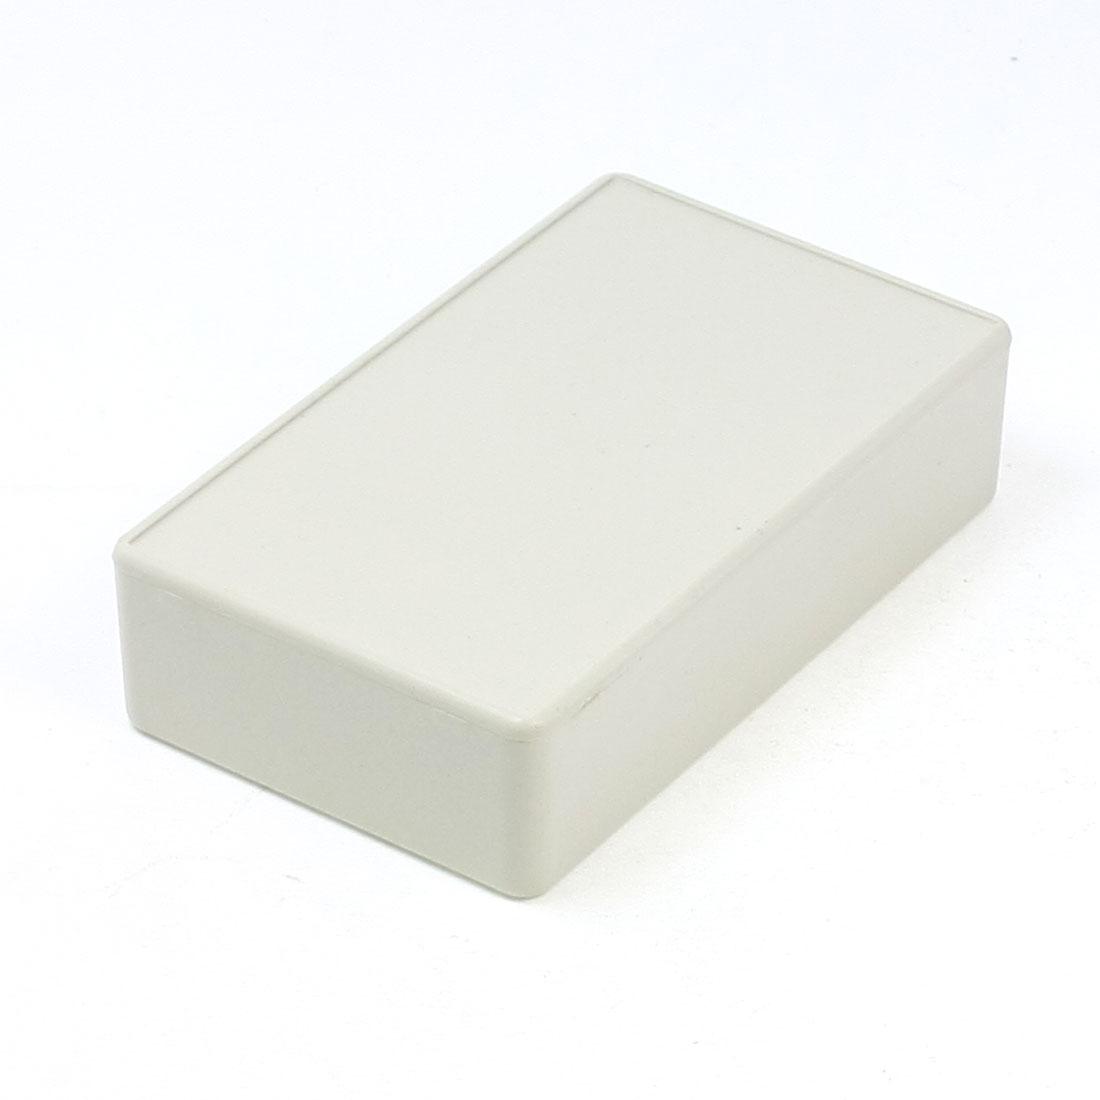 100mm x 60mm x 25mm Plastic Enclosure Case DIY Junction Box